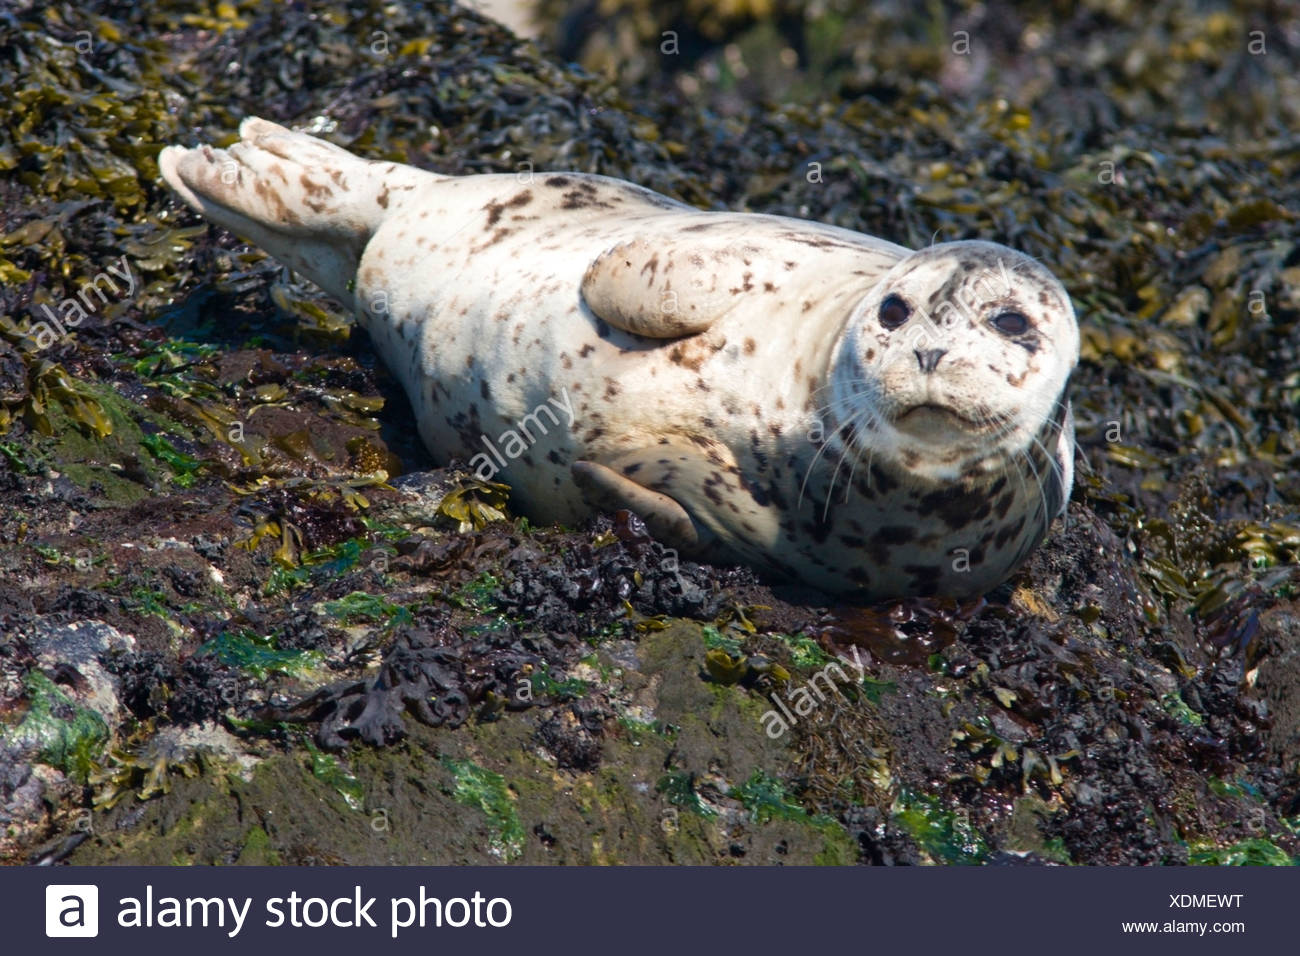 Fur seal (Callorhinus ursinus) basking on rocks near Victoria, Vancouver Island, British Columbia, Canada - Stock Image